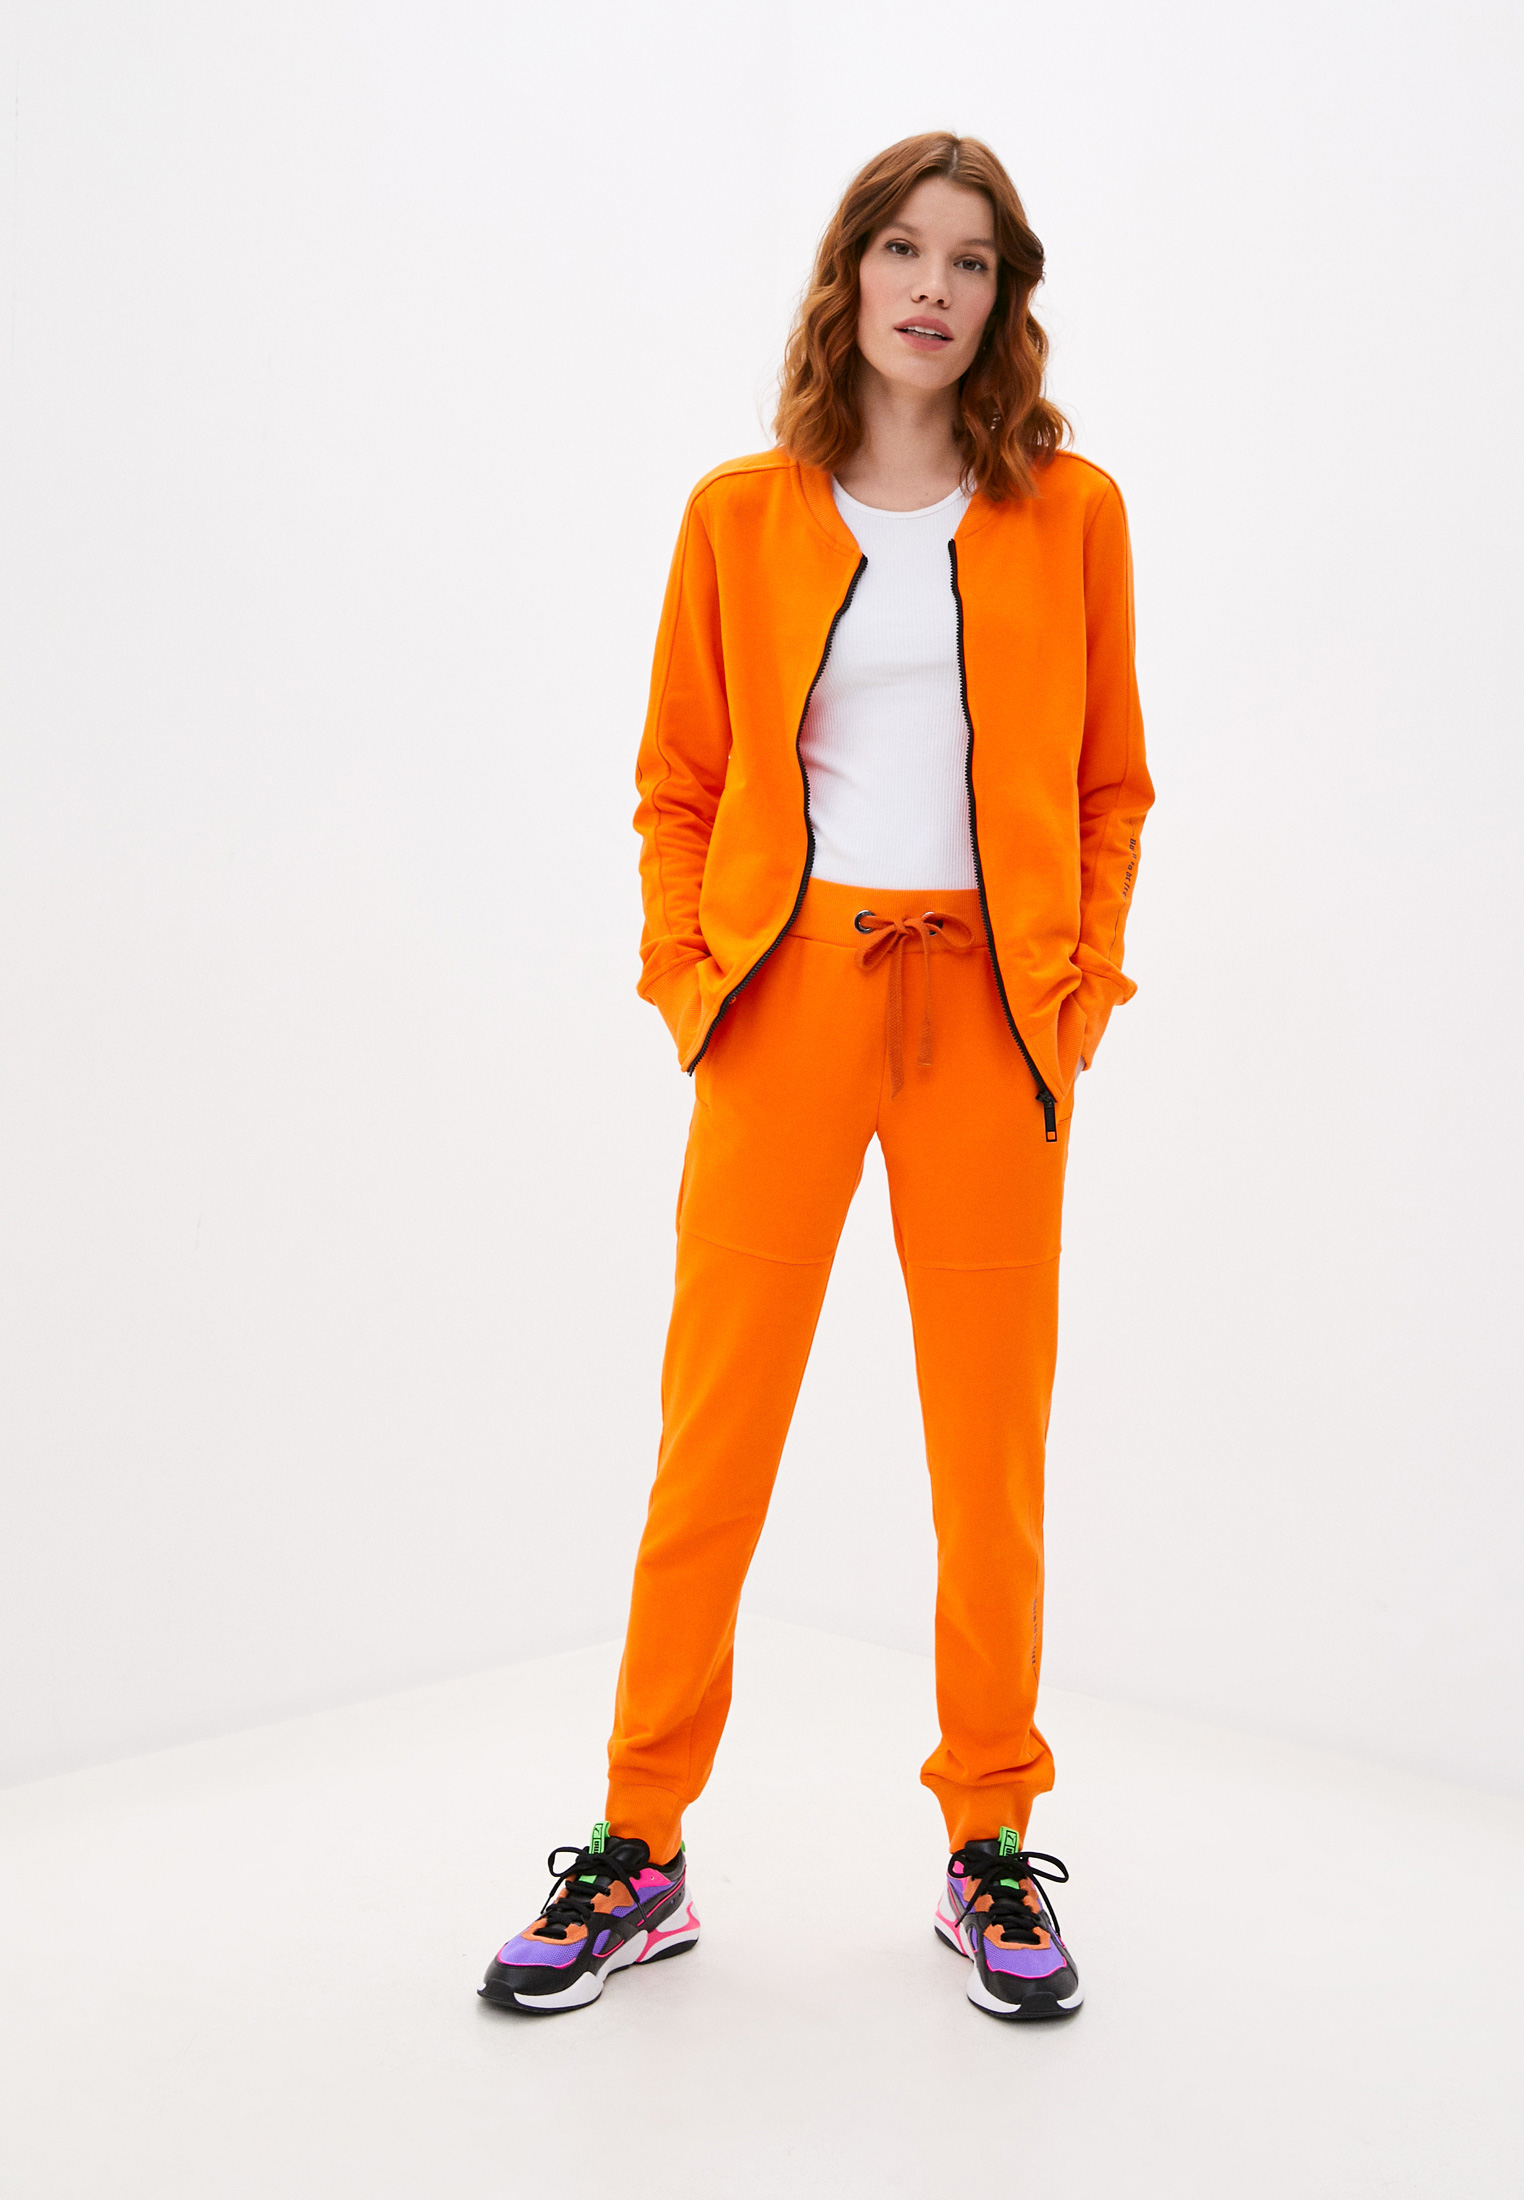 Спортивный костюм Sitlly 20321